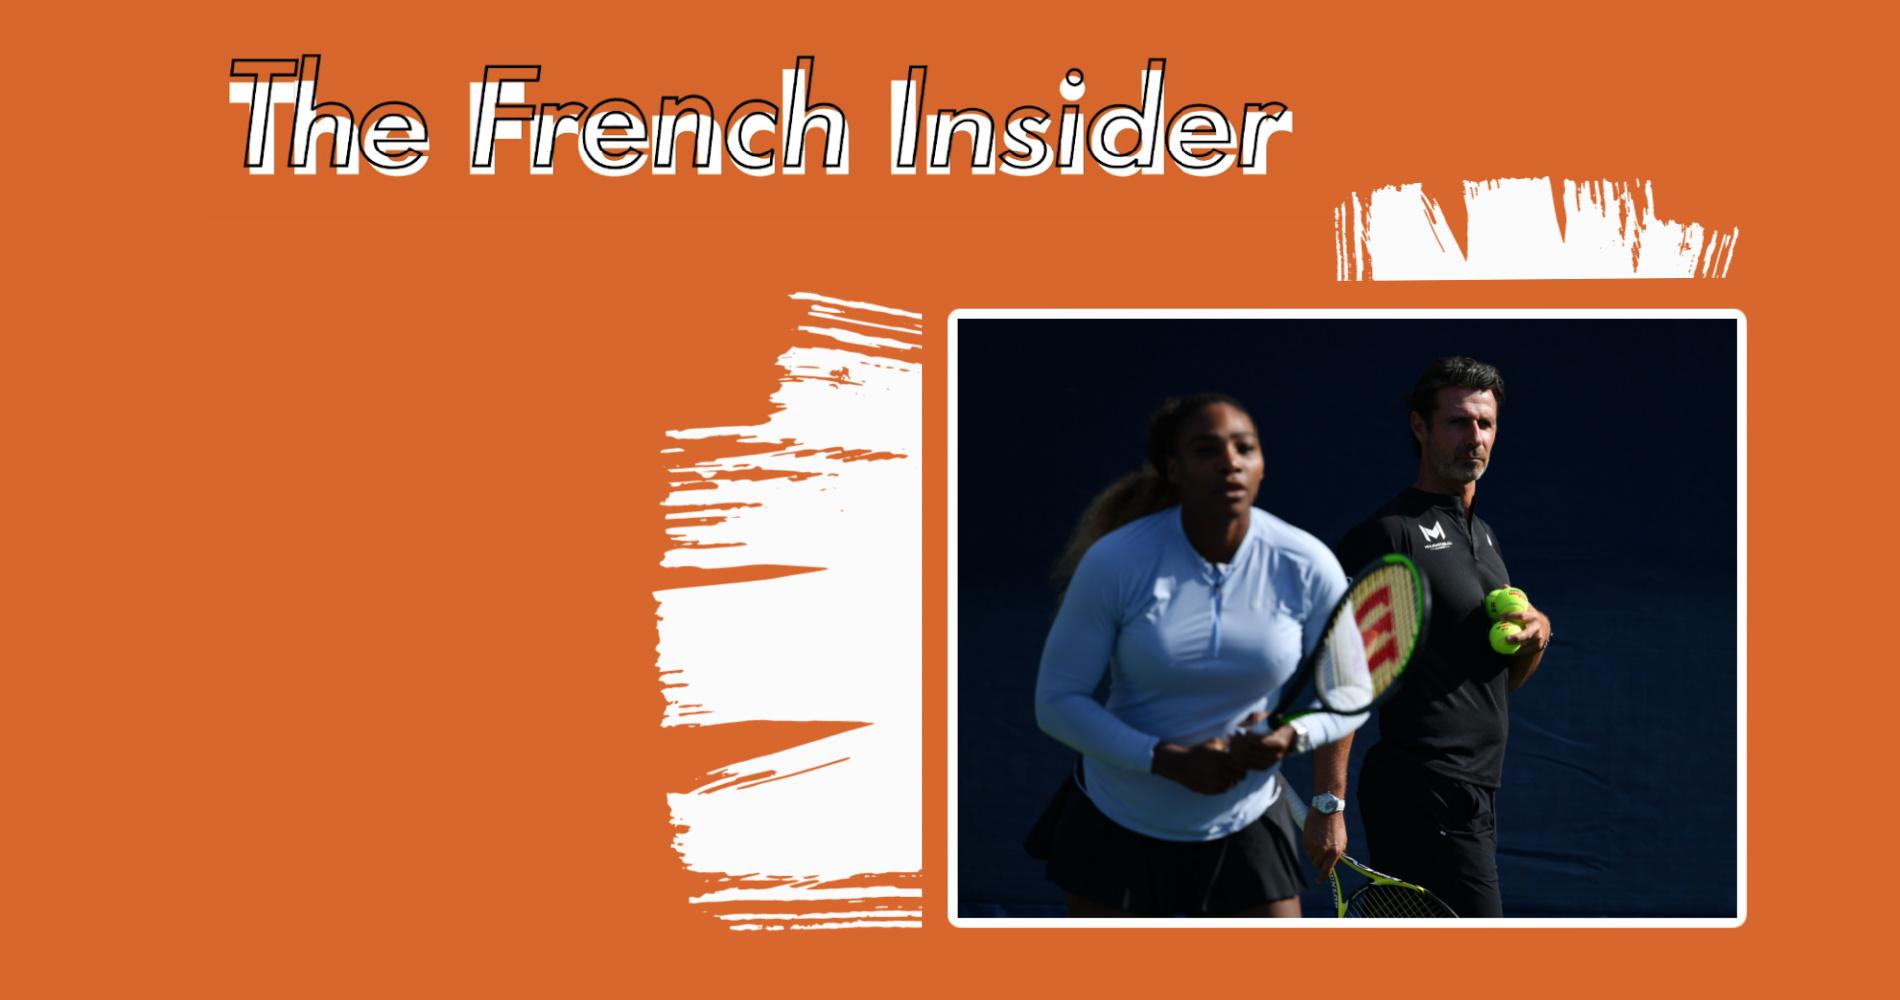 The French Insider #3 : Patrick-Serena Extrait (1)